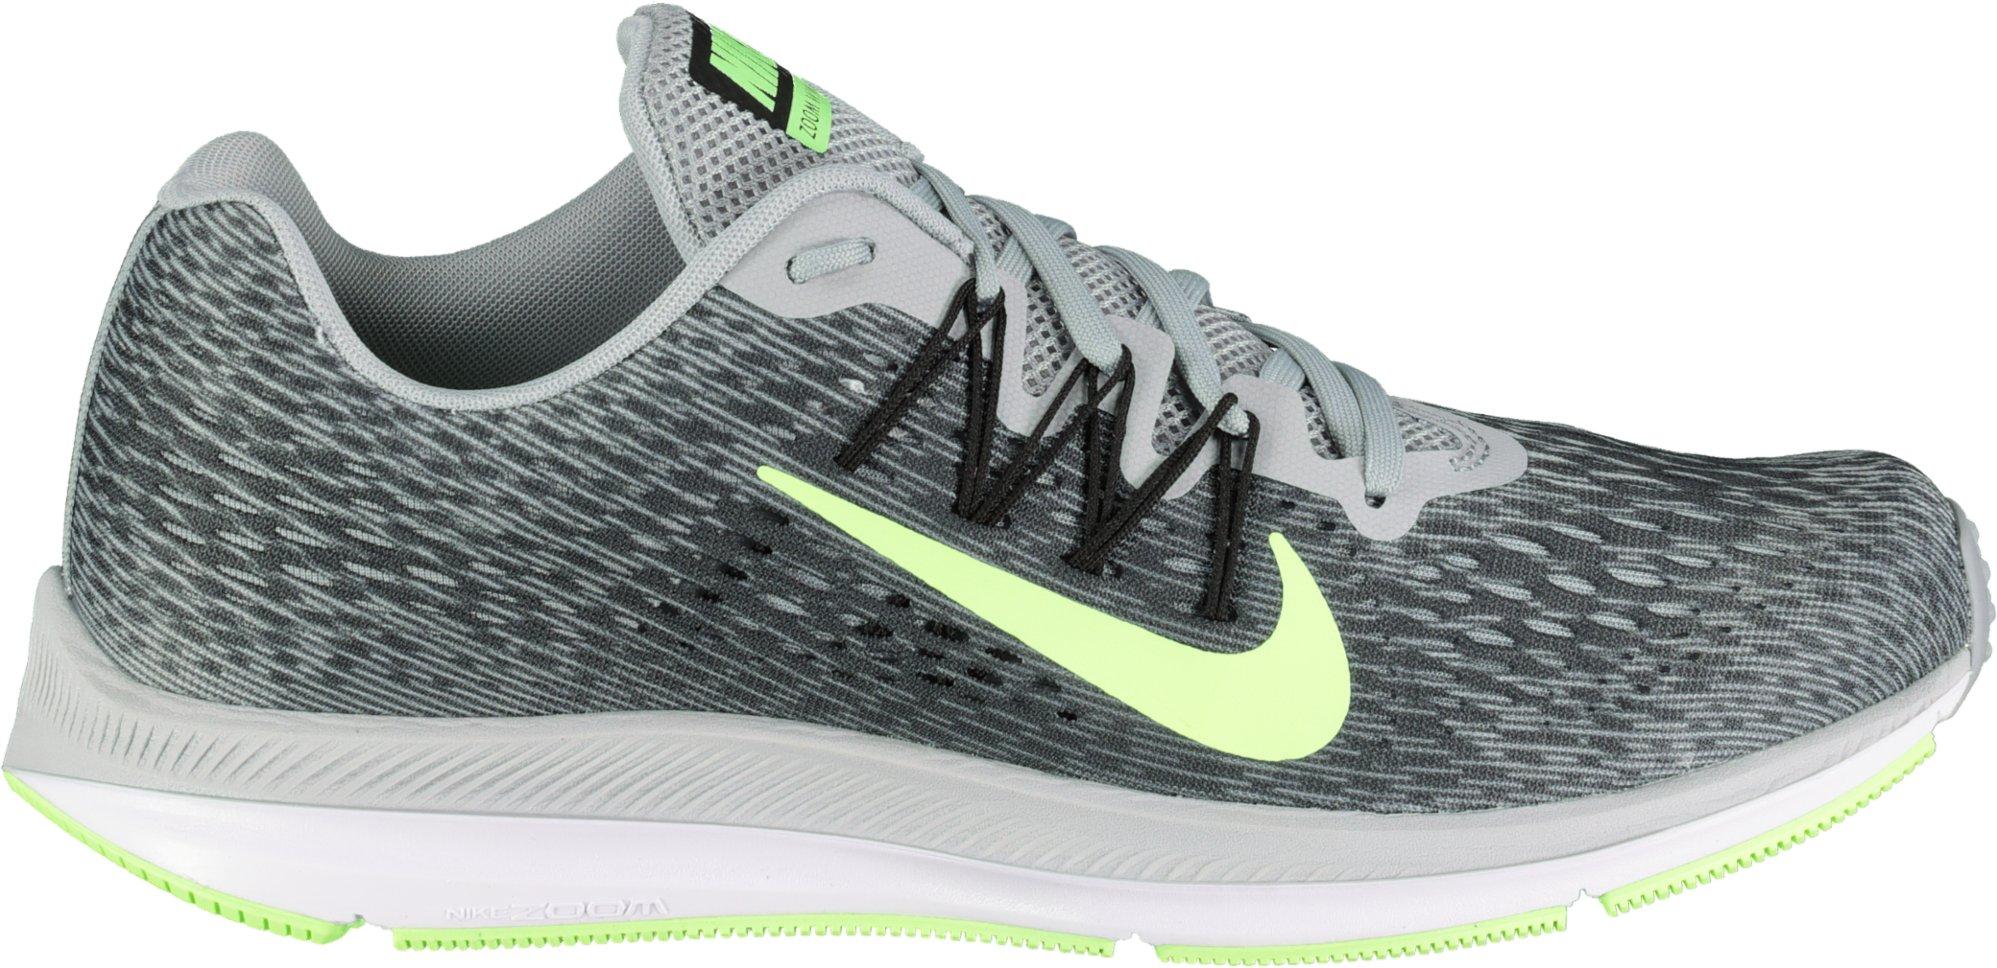 Nike Zoom Start + 2009